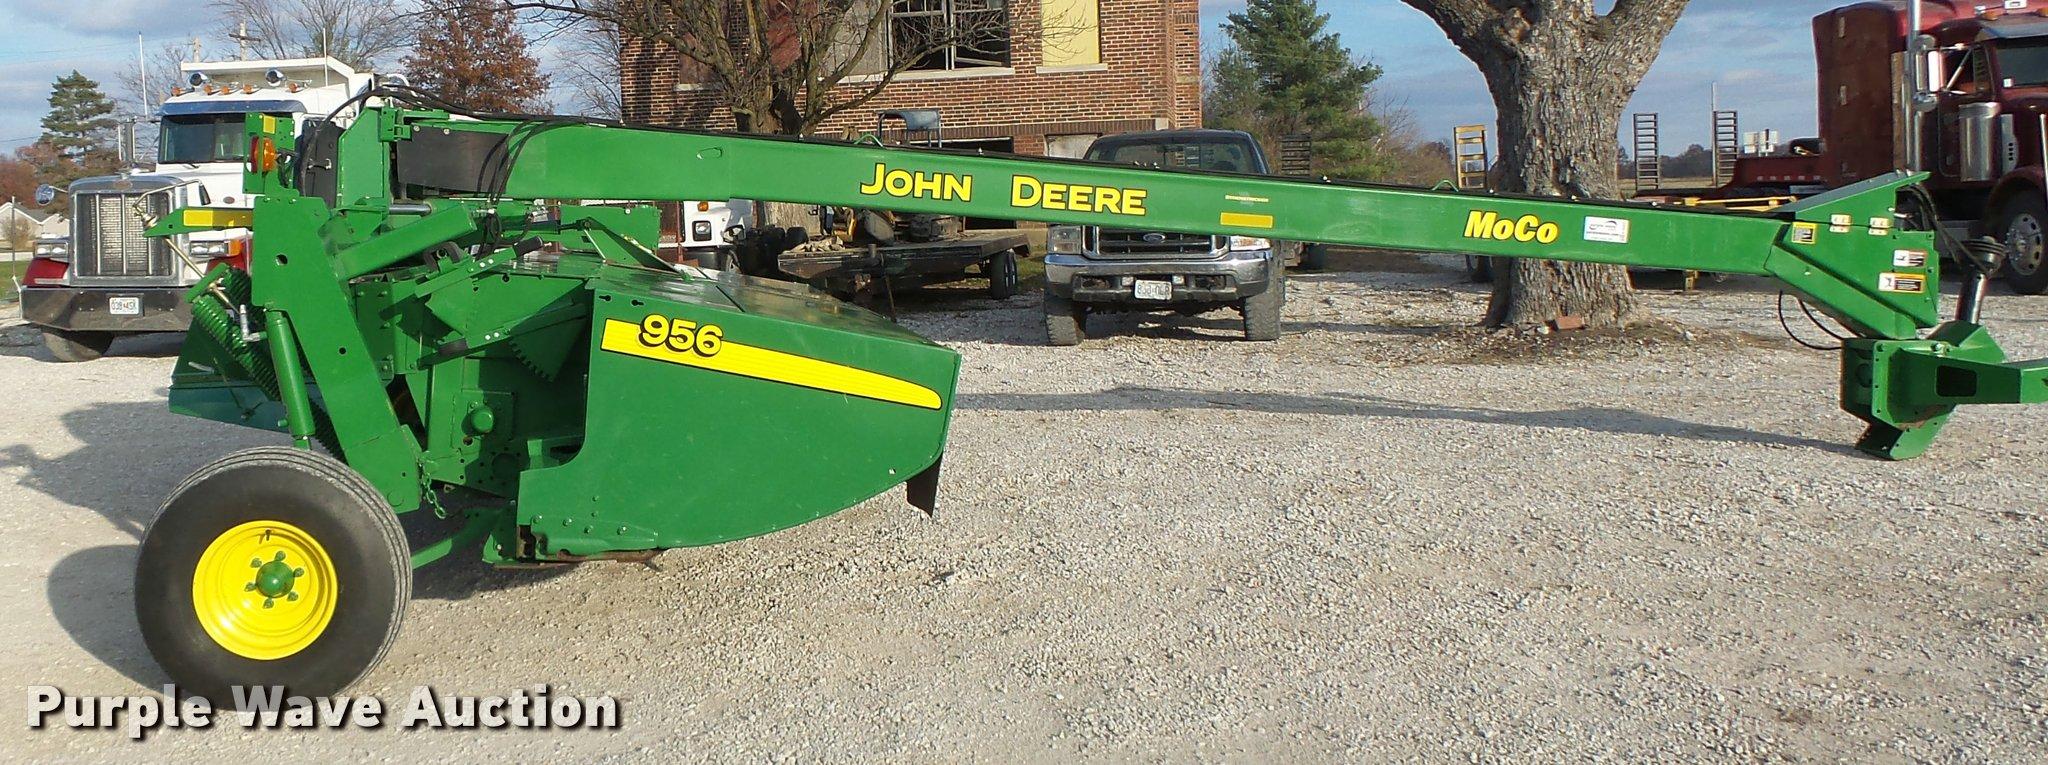 2013 John Deere 956 disc mower conditioner | Item K5523 | SO